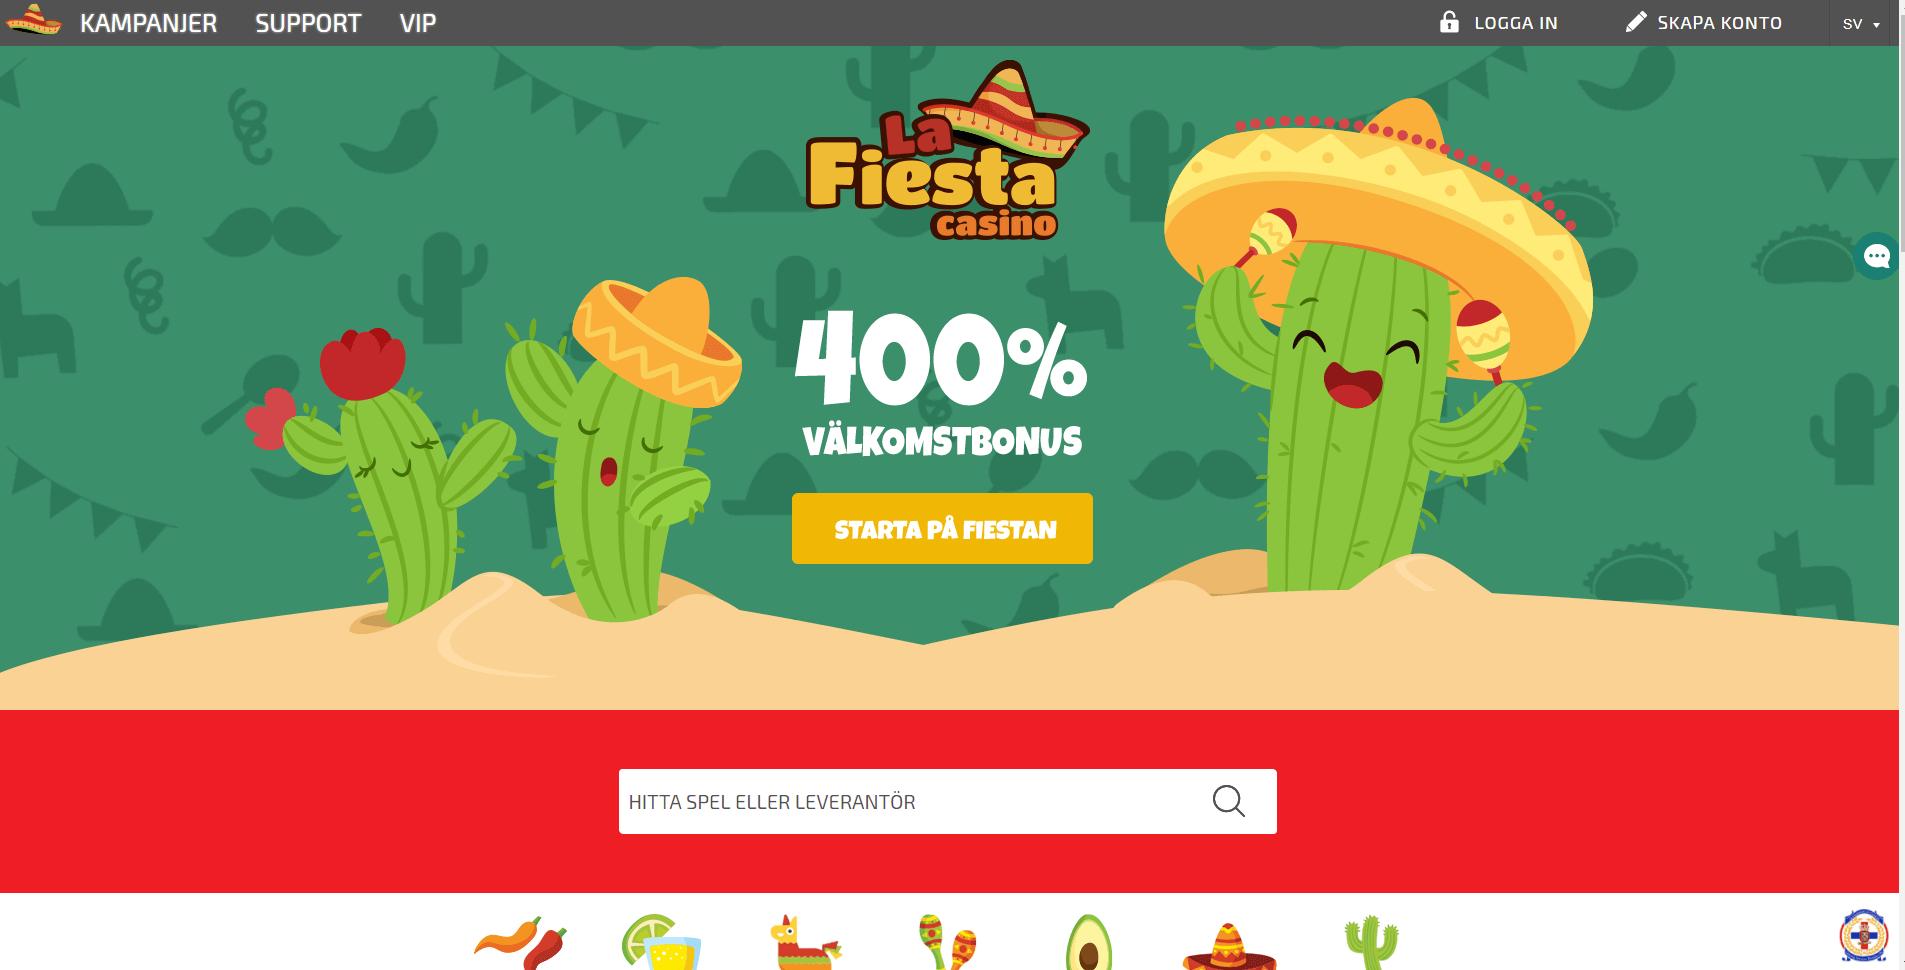 La Fiesta Casinots kampanjer